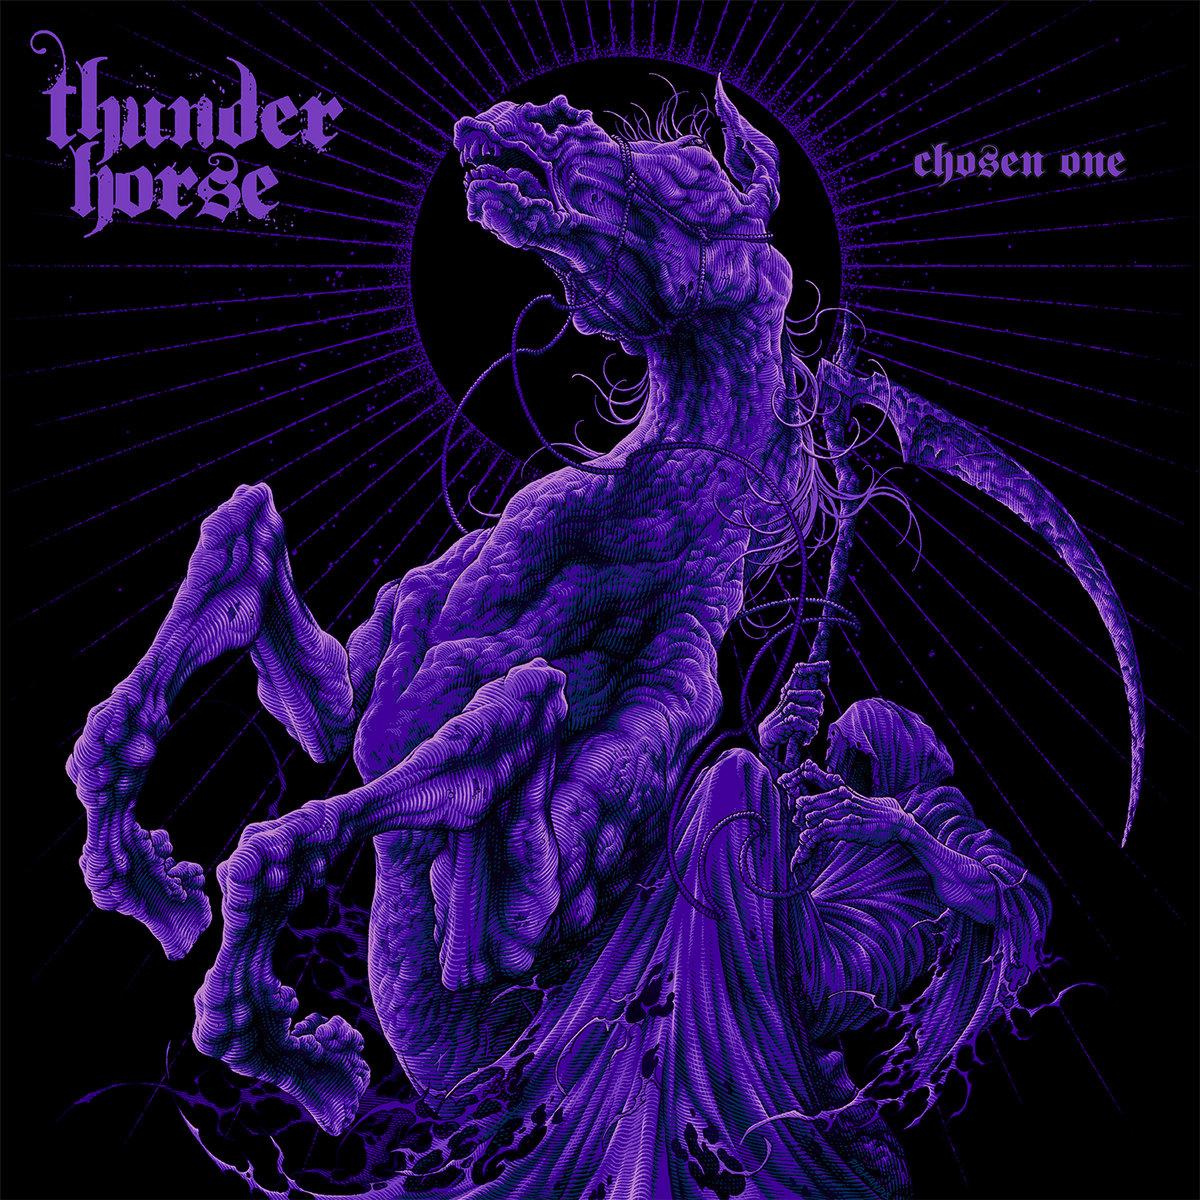 Thunder Horse Chosen One